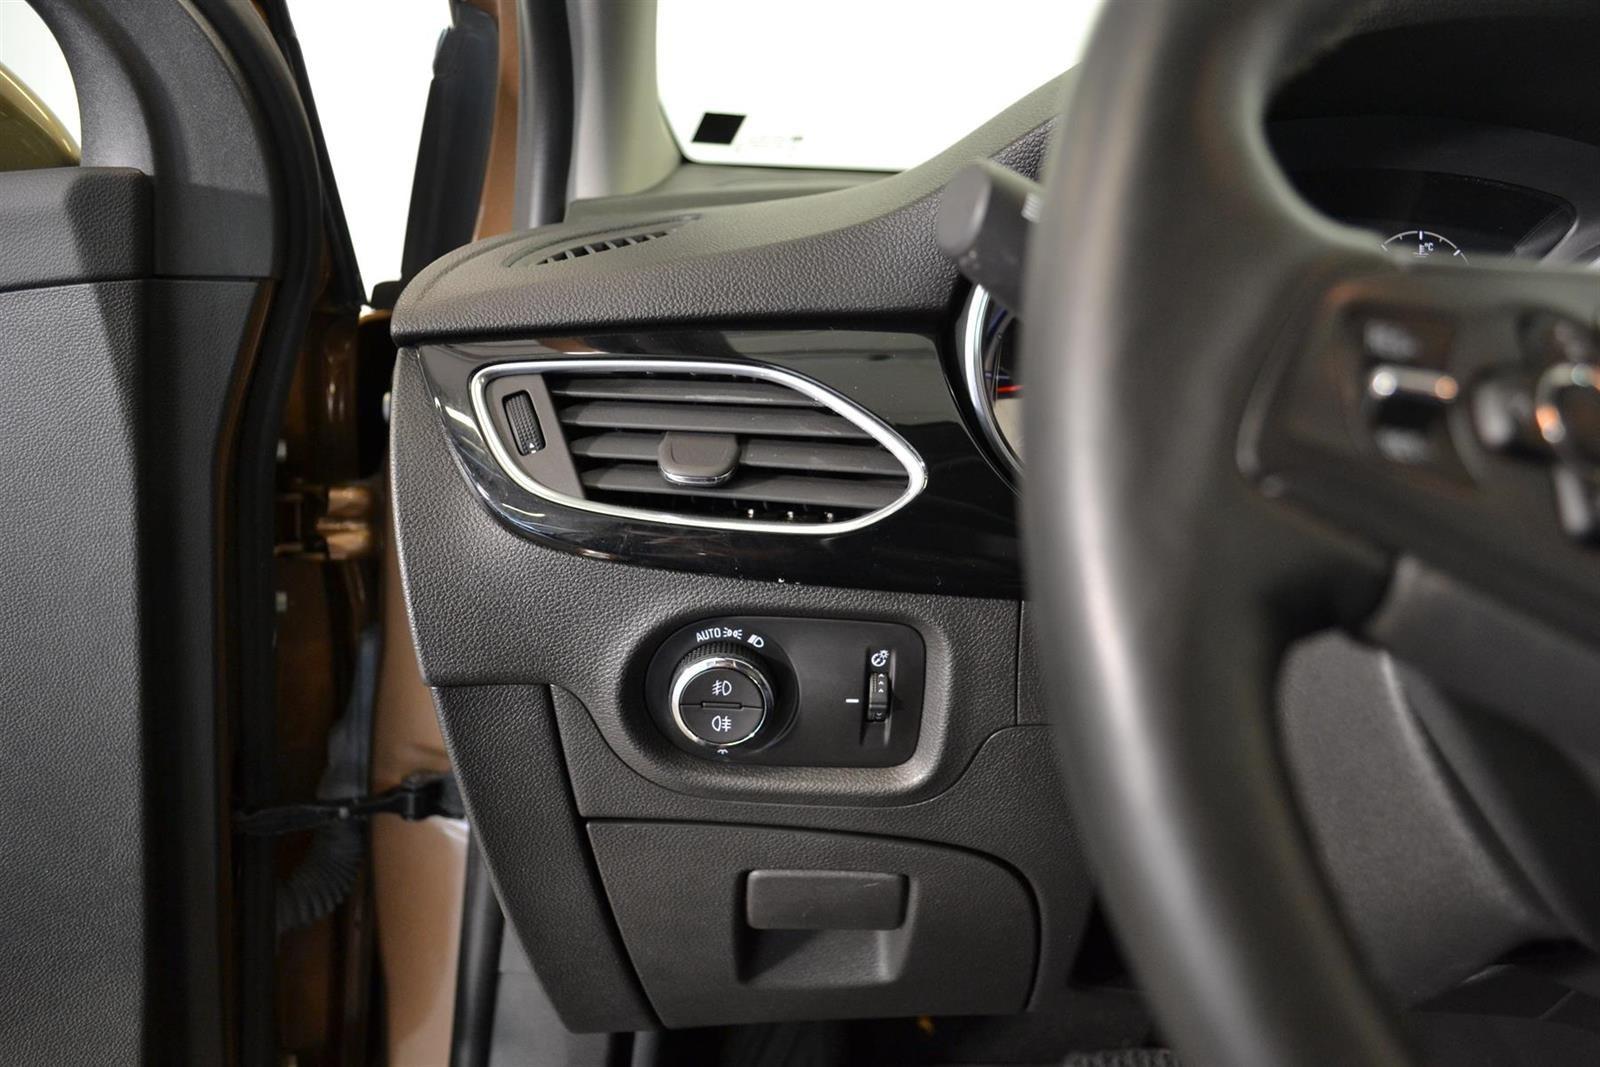 Opel Astra Slide 16